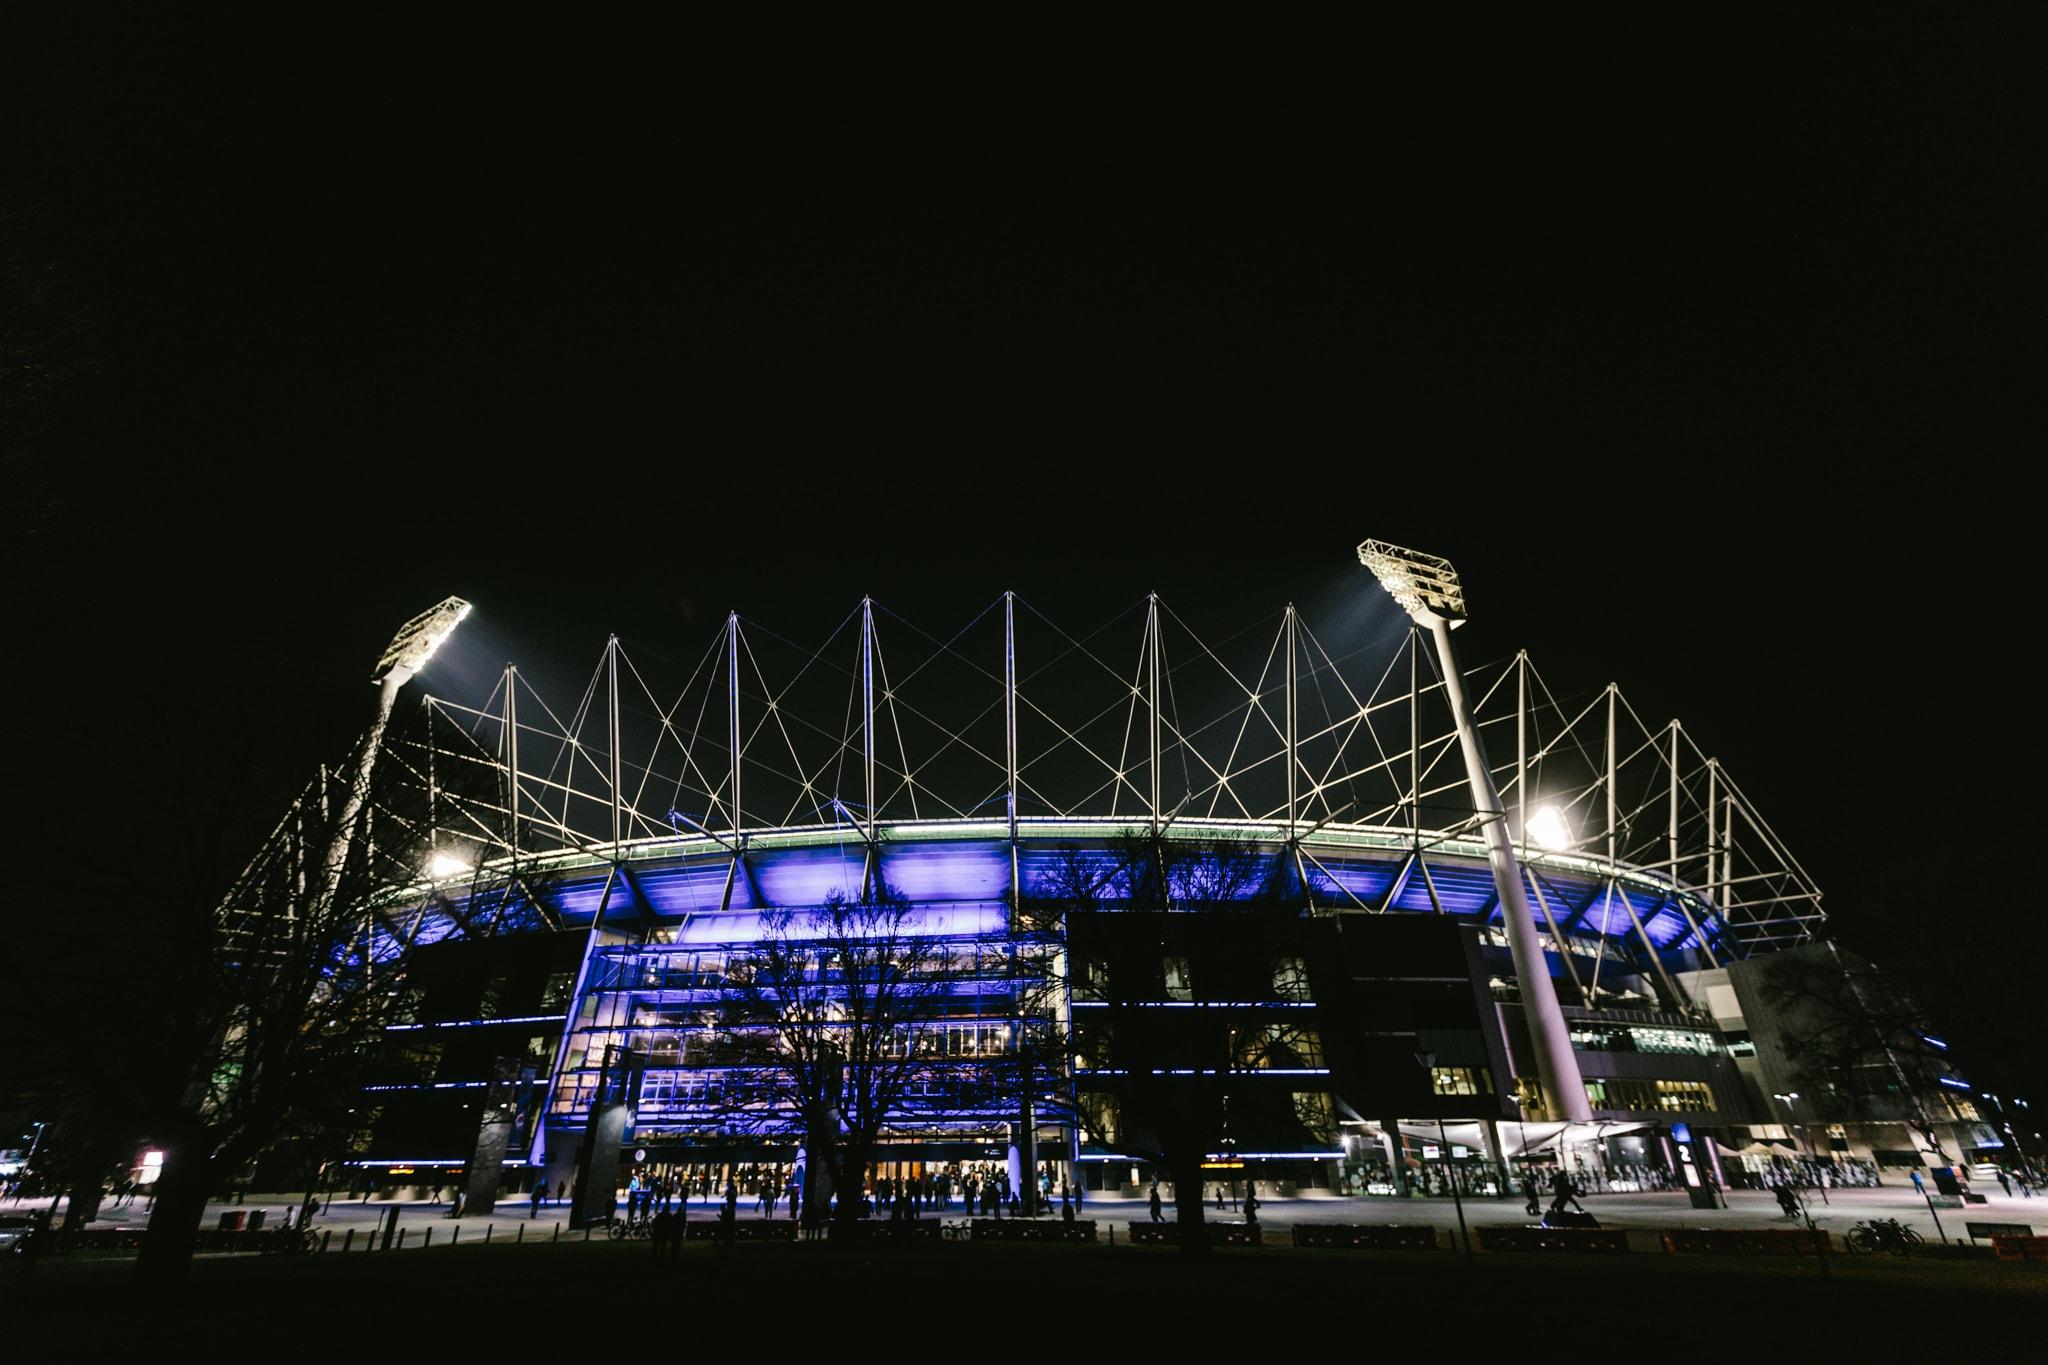 Melbourne MCG at night